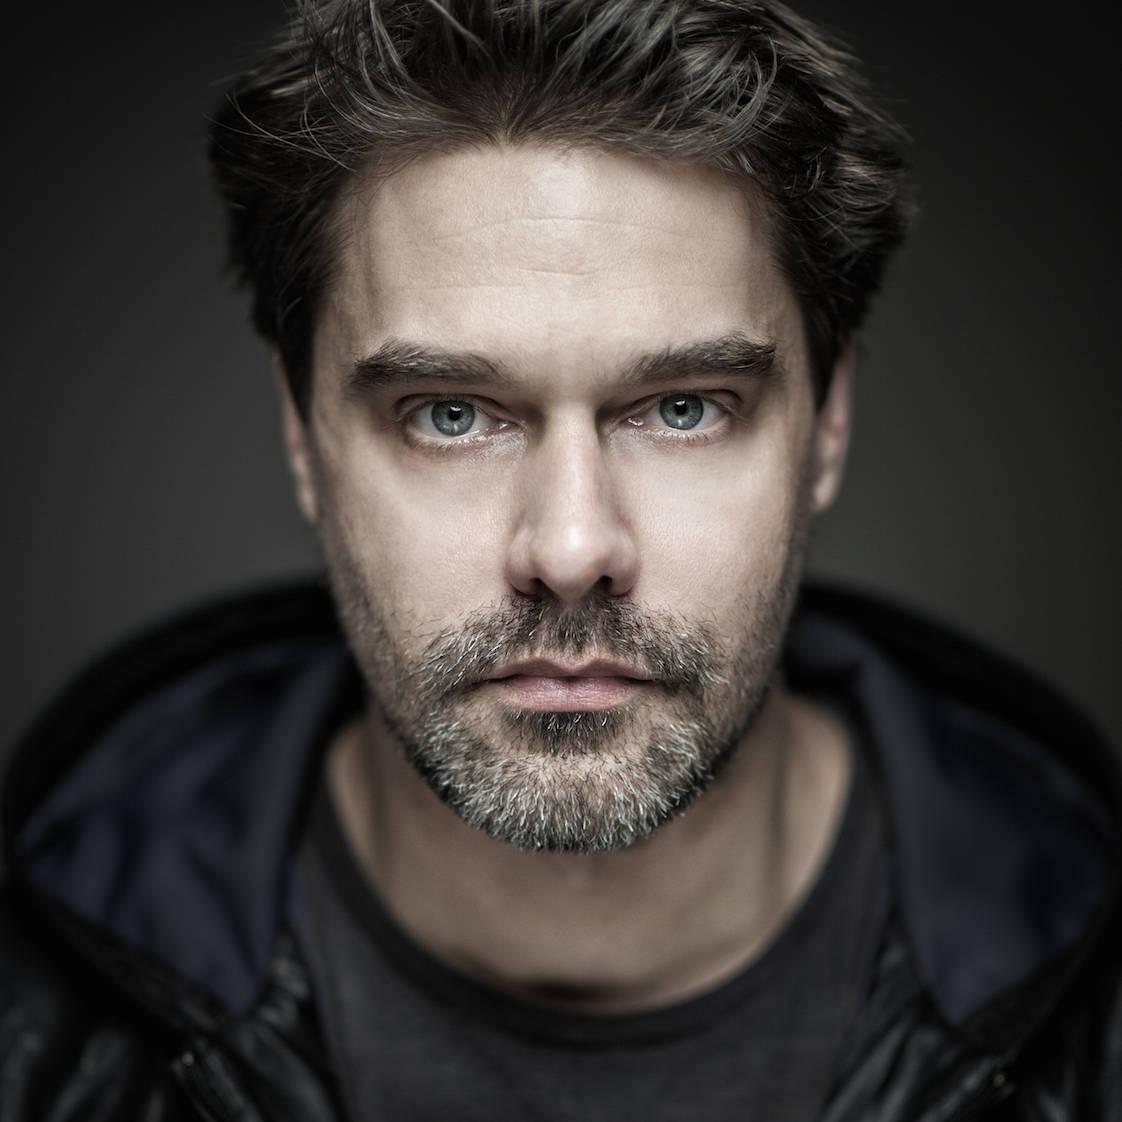 Gzsz schauspieler 2015